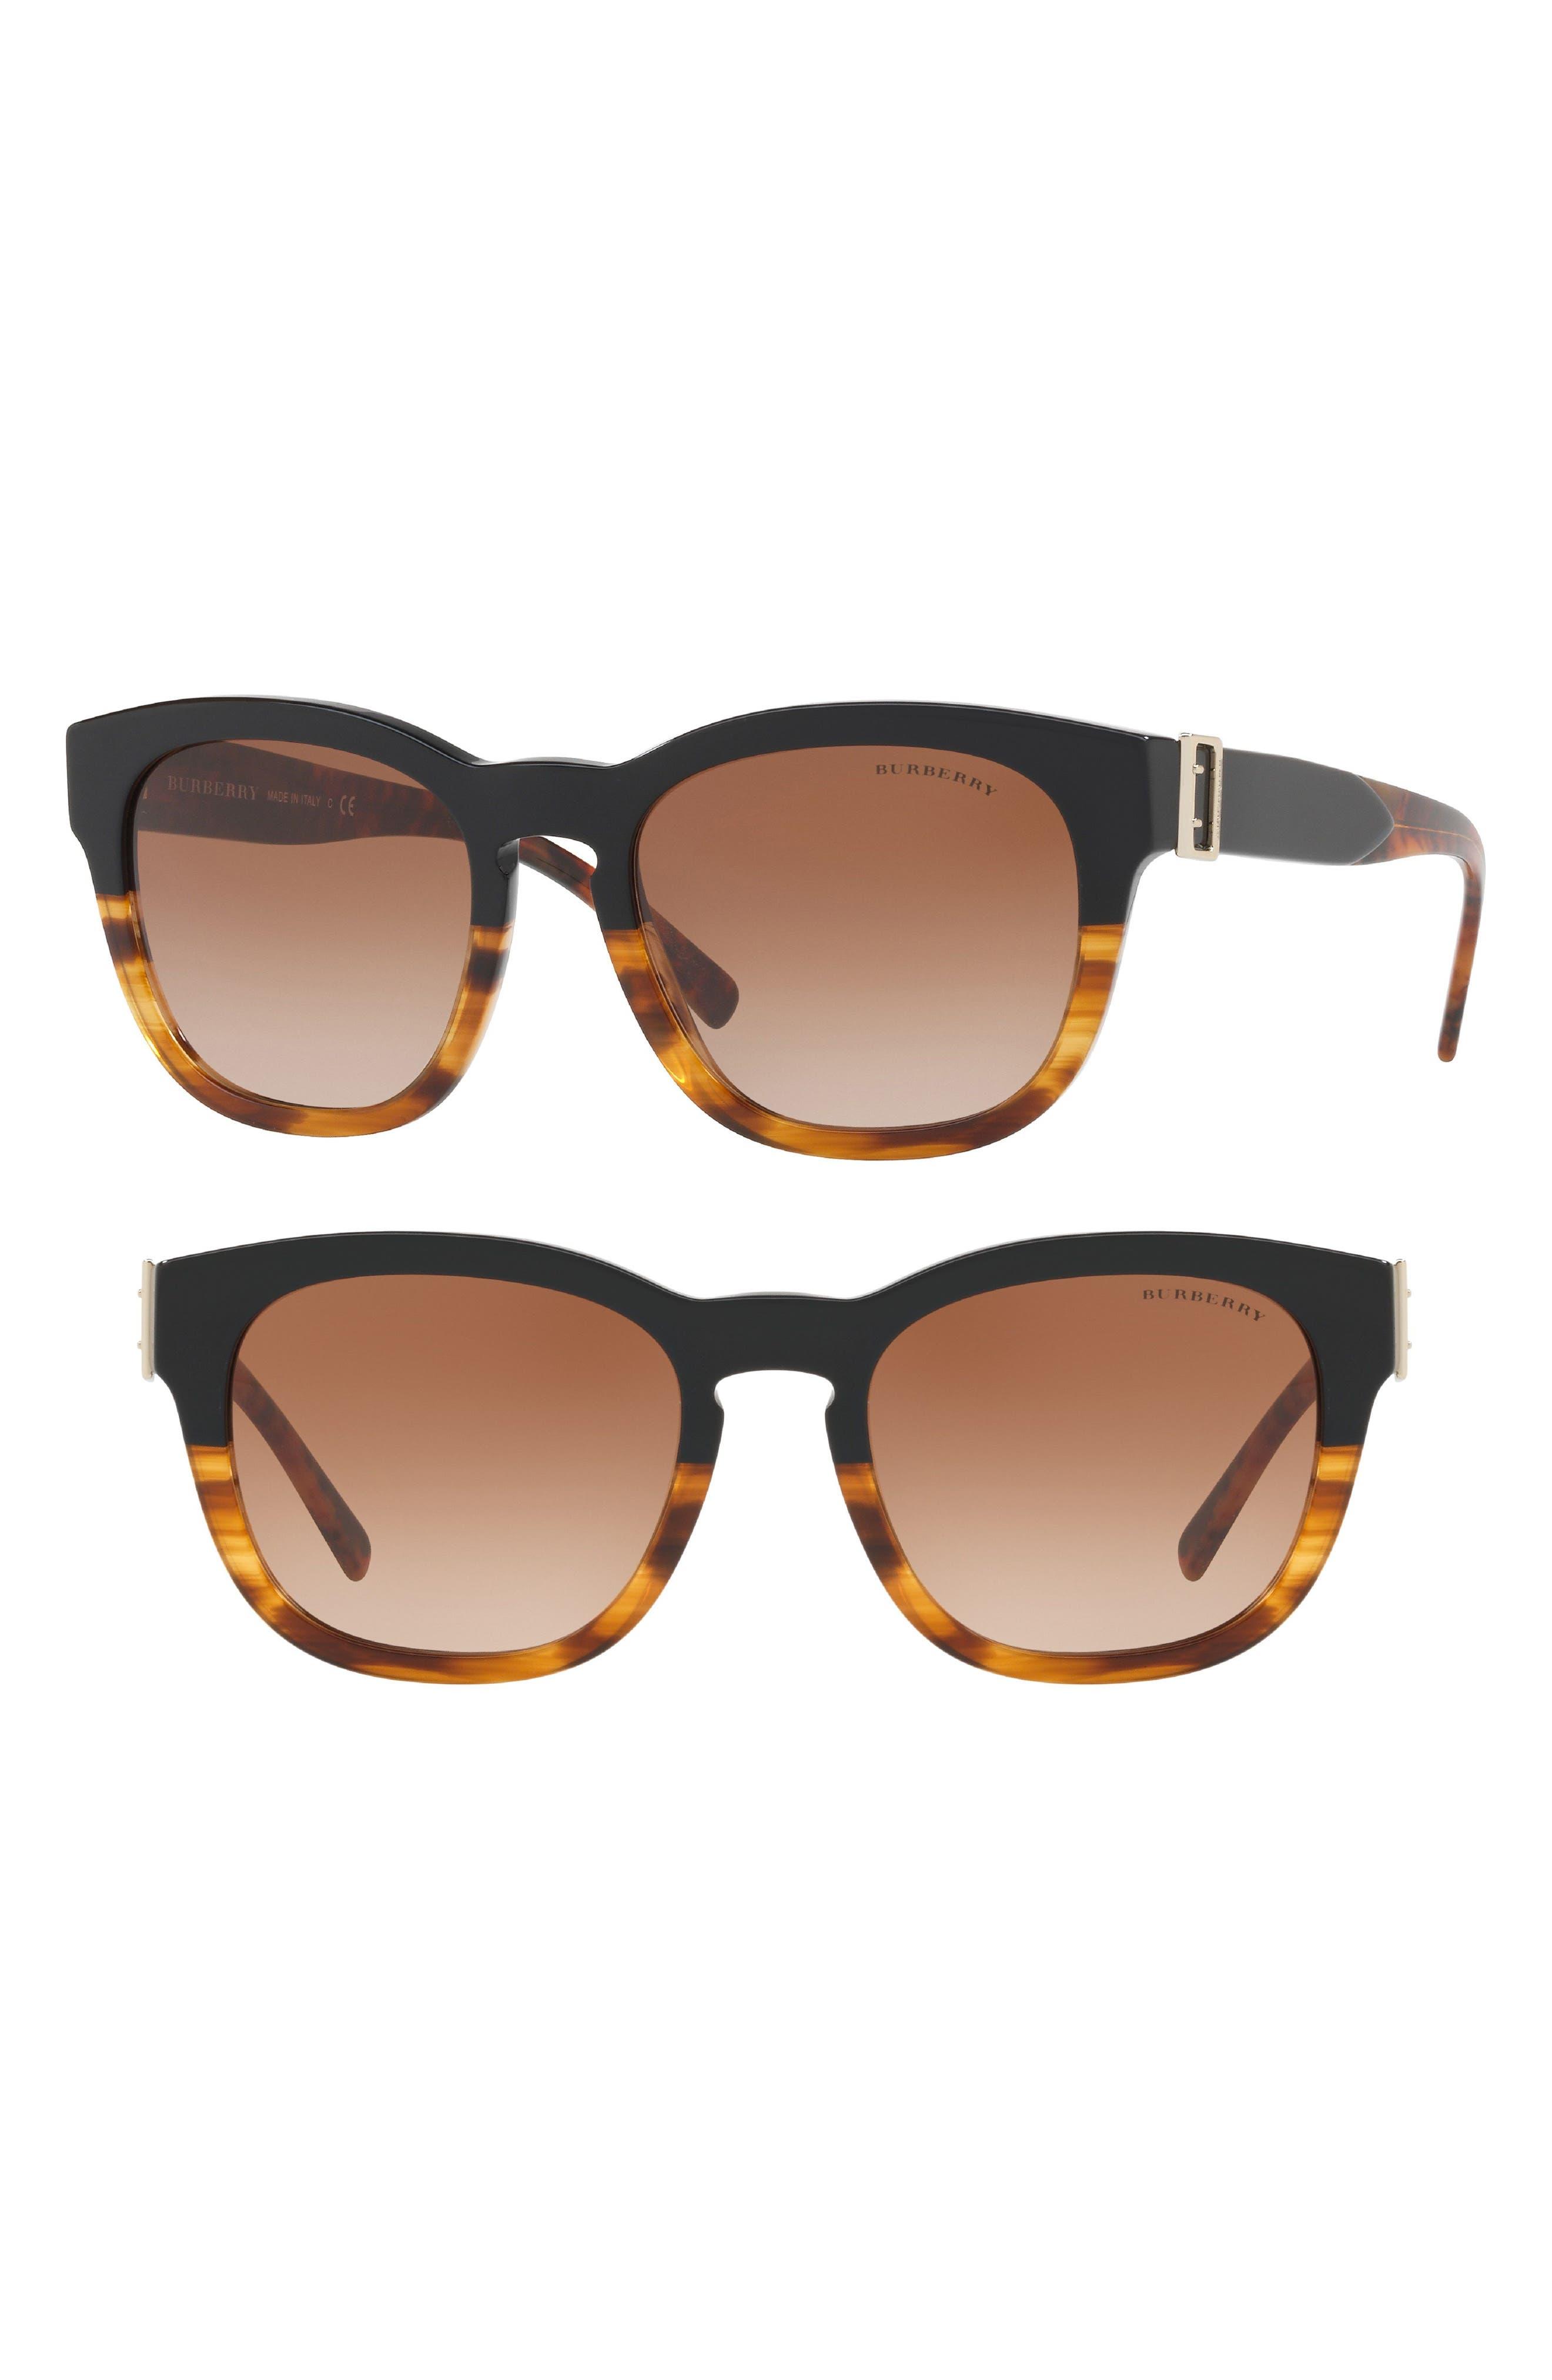 Burberry 54mm Cat Eye Sunglasses